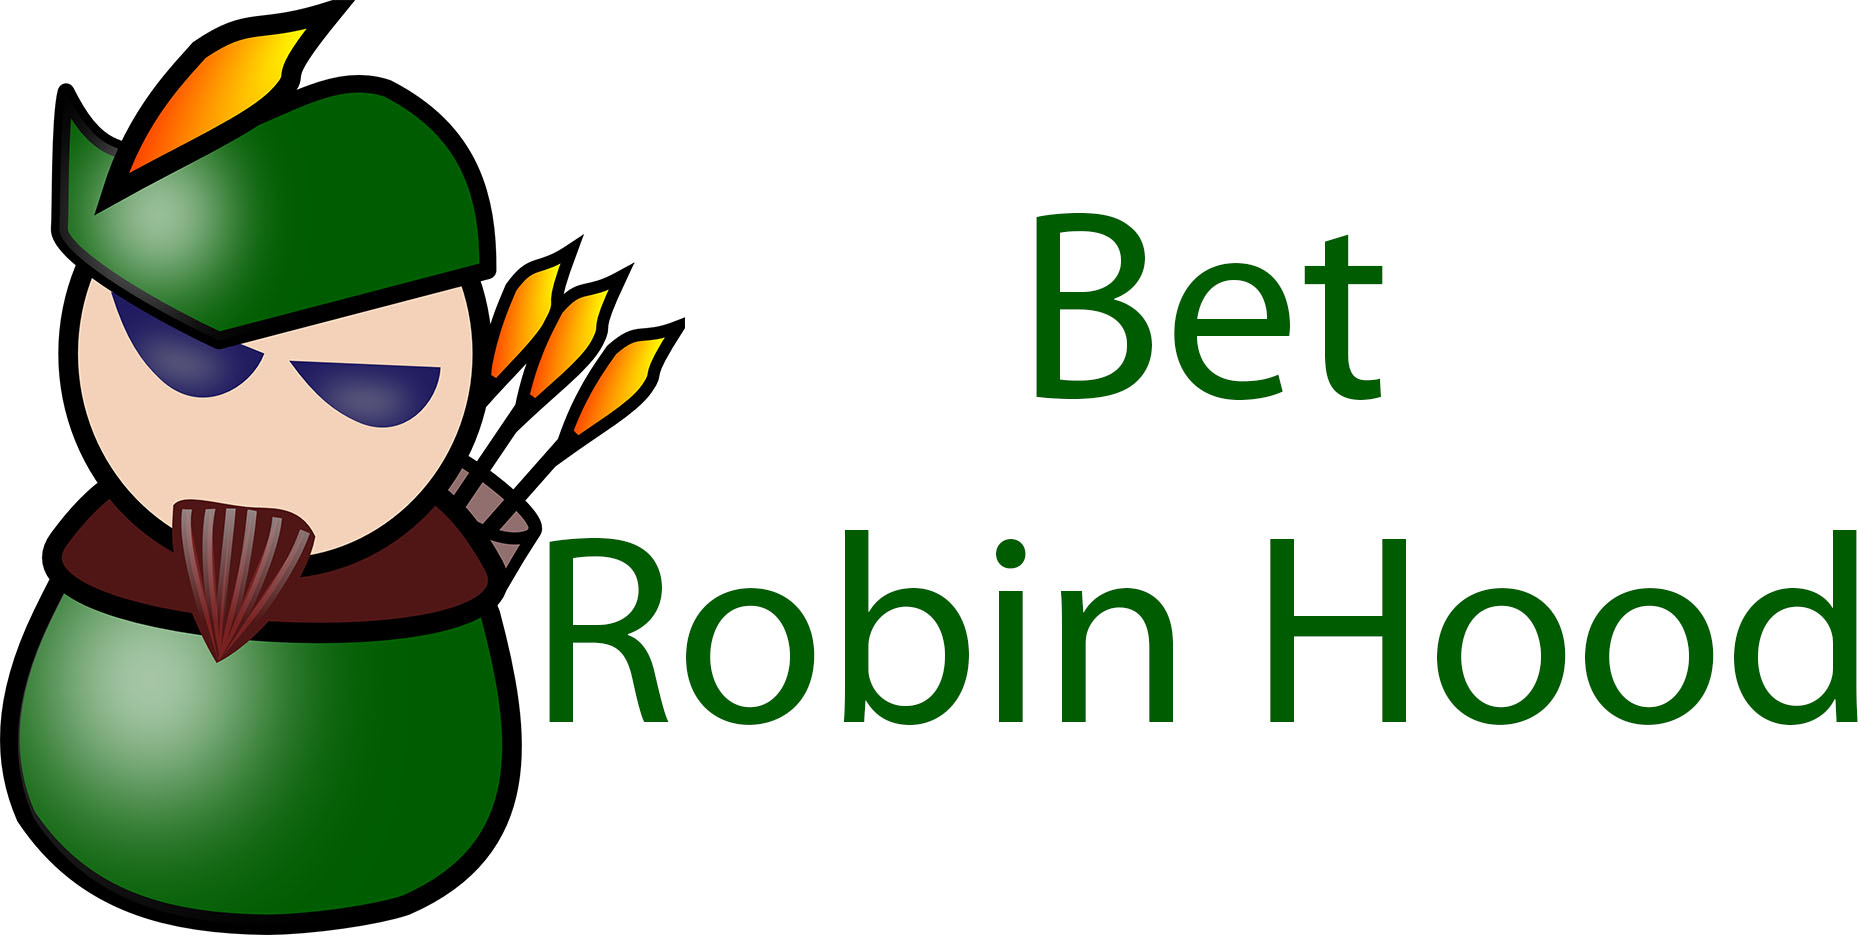 Bet Robin Hood